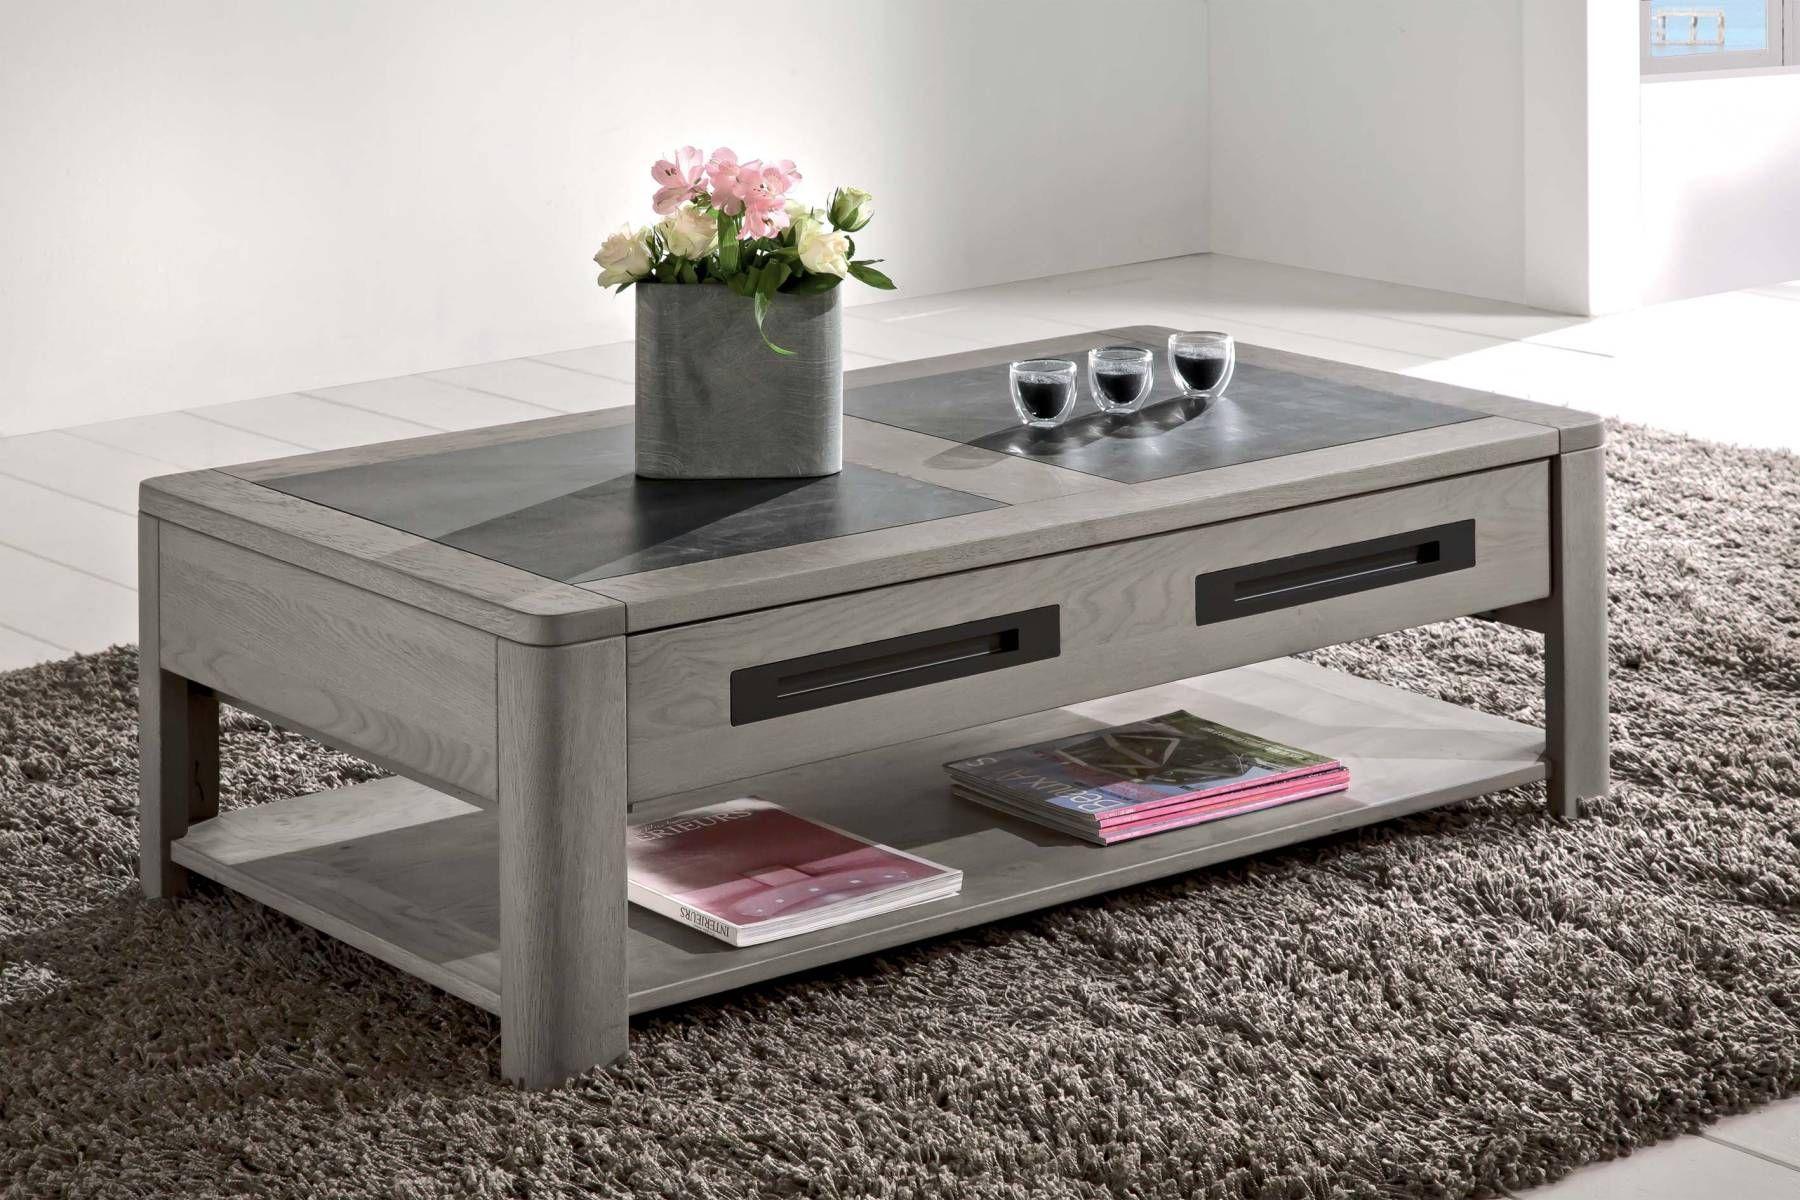 Deauvil Table Basse Rectangulaire Naturel Chene Table De Salon Table Basse Table Basse Ceramique